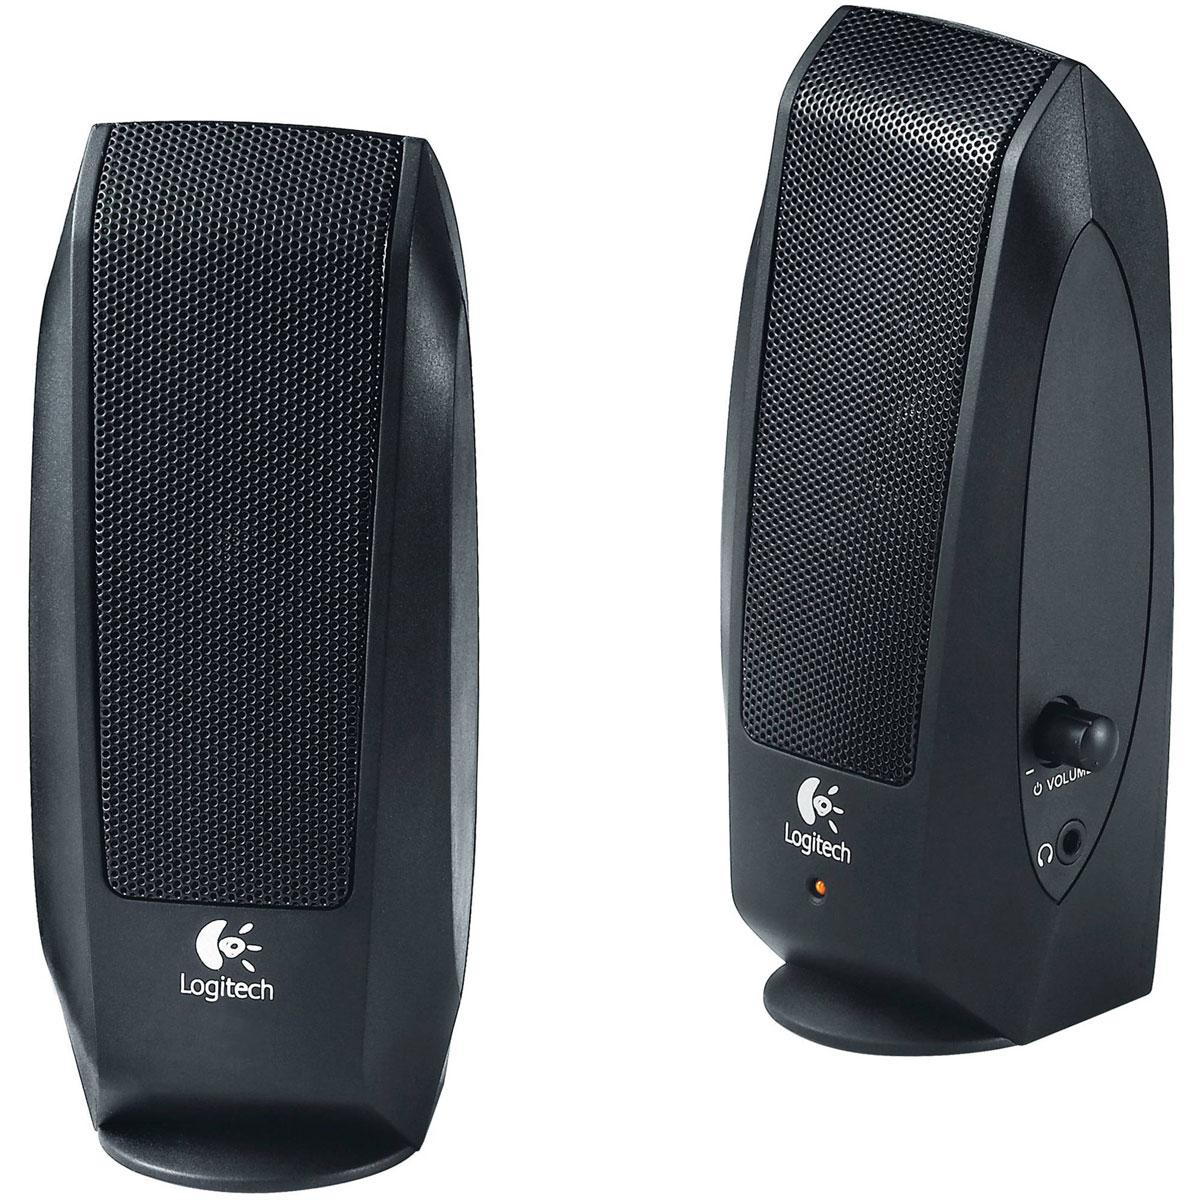 Logitech S120 Speaker System 2.0, Black колонки